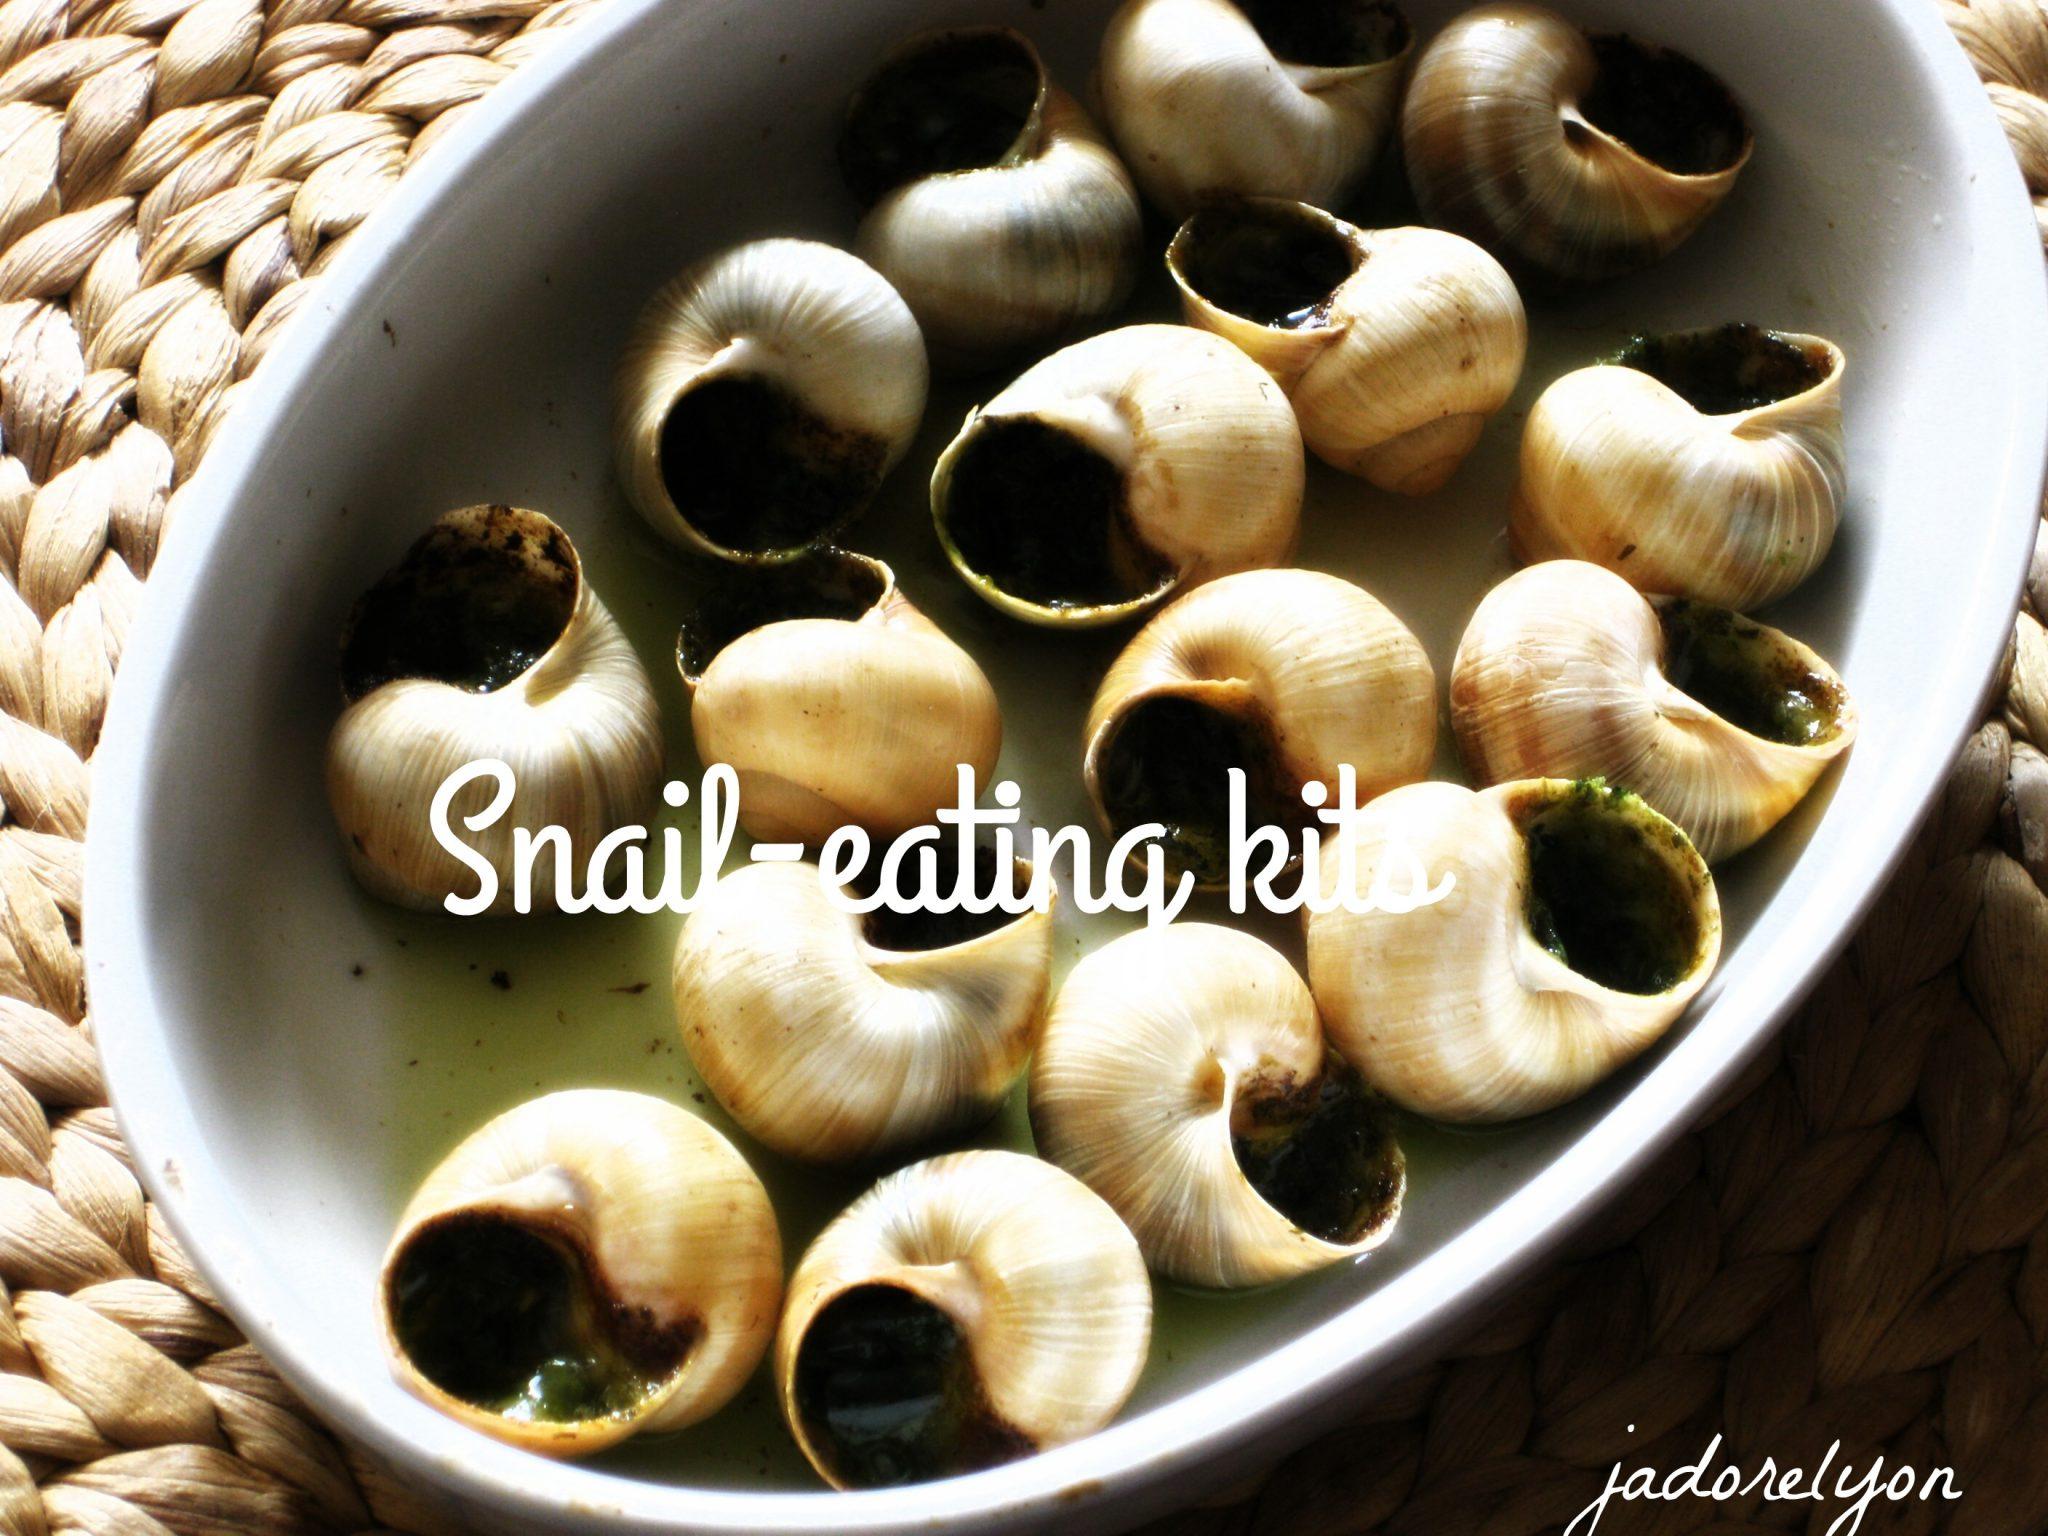 Snail eating kits.